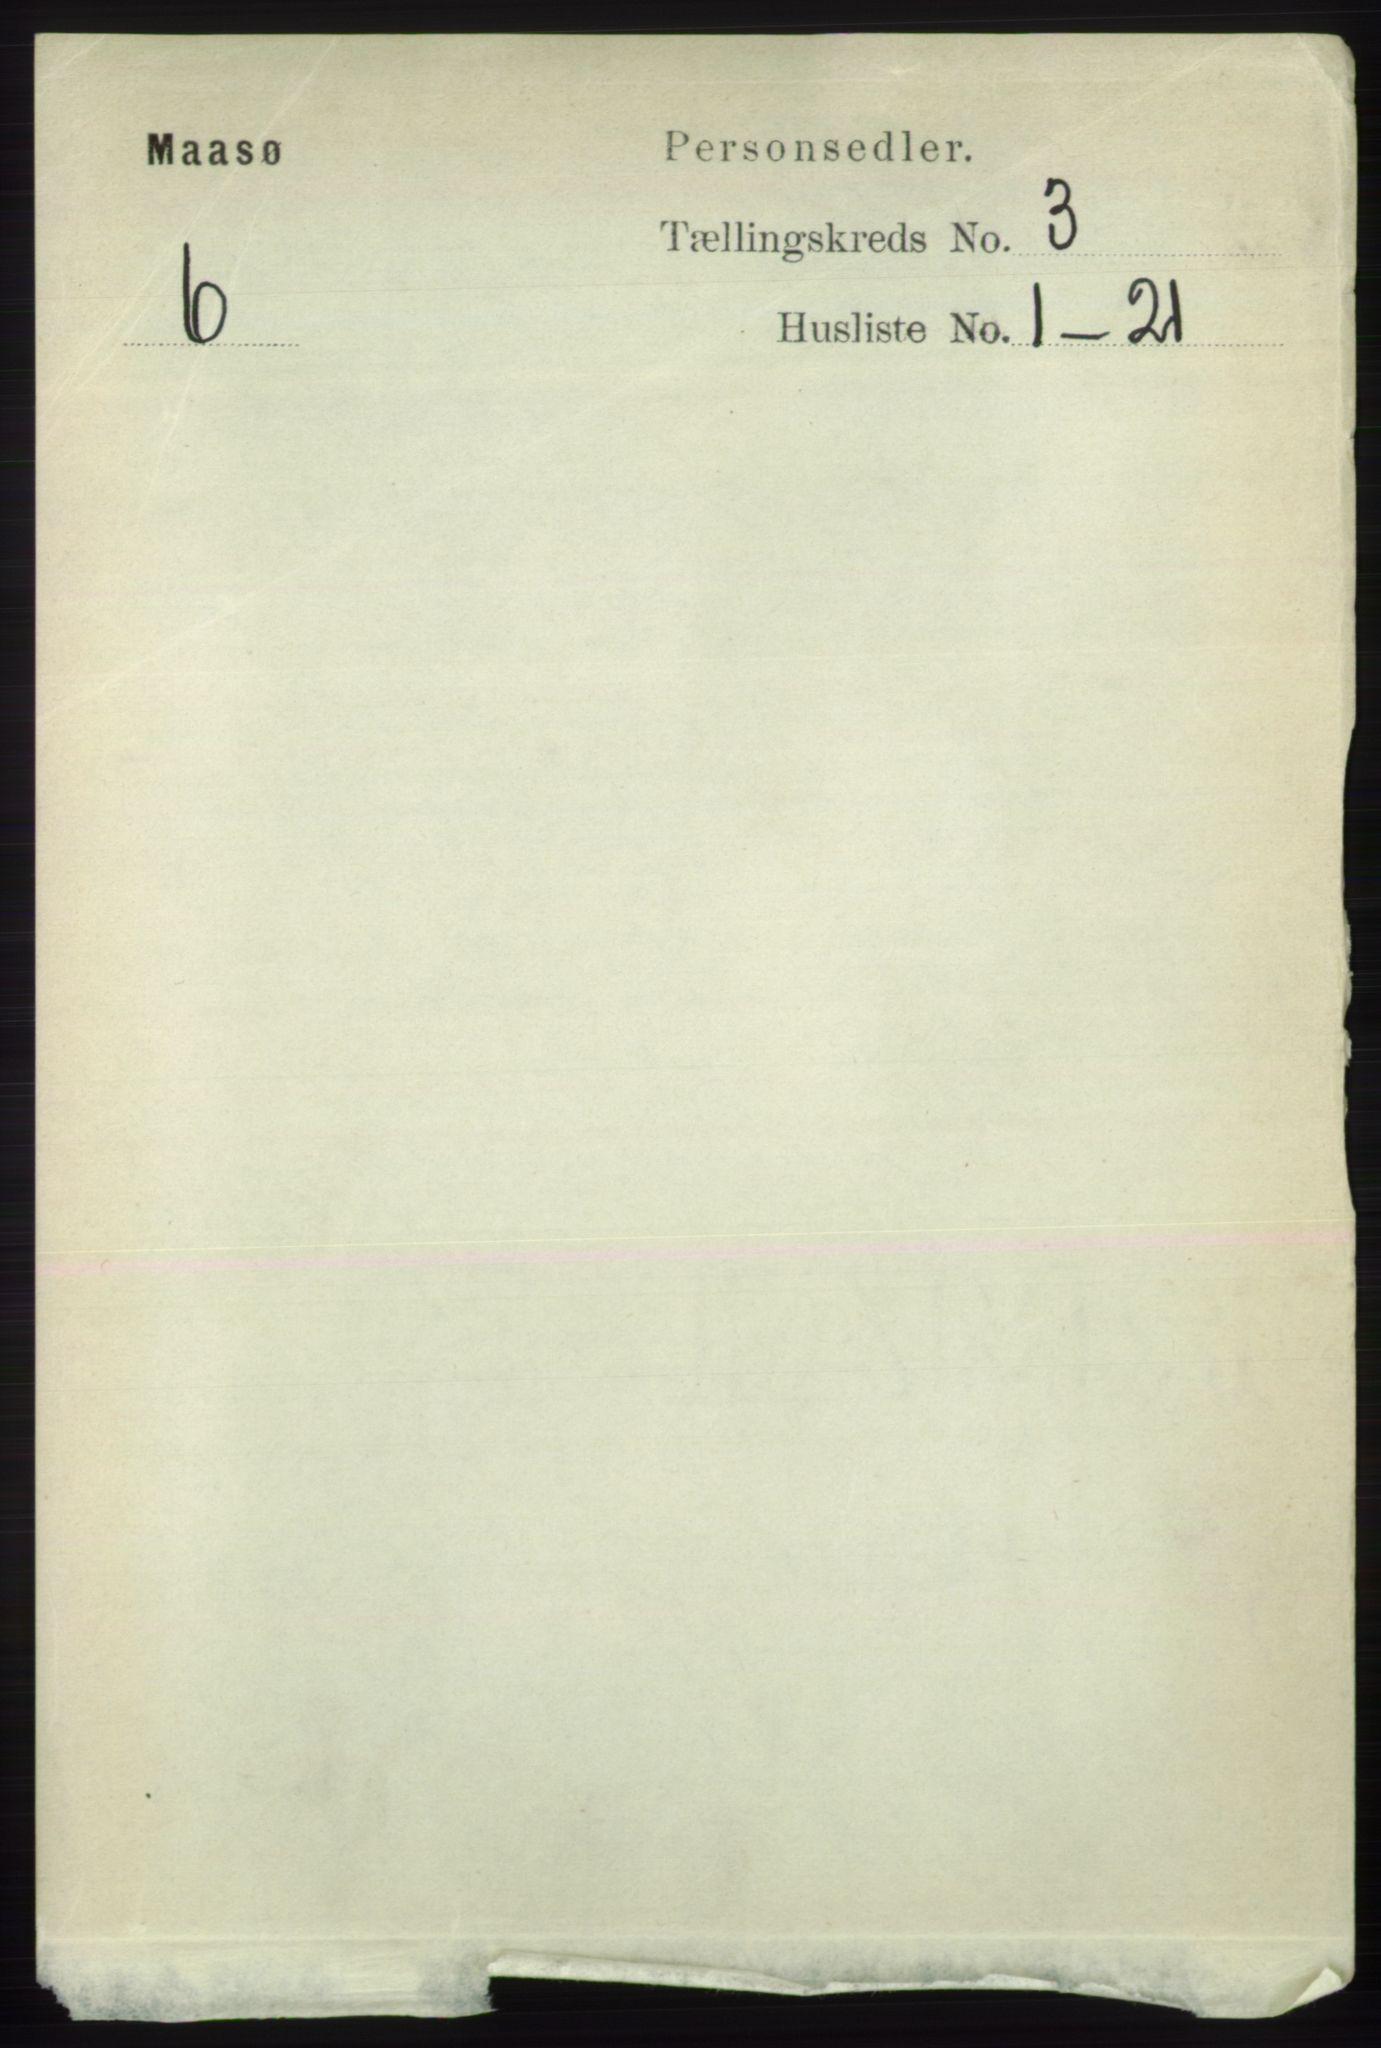 RA, Folketelling 1891 for 2018 Måsøy herred, 1891, s. 383